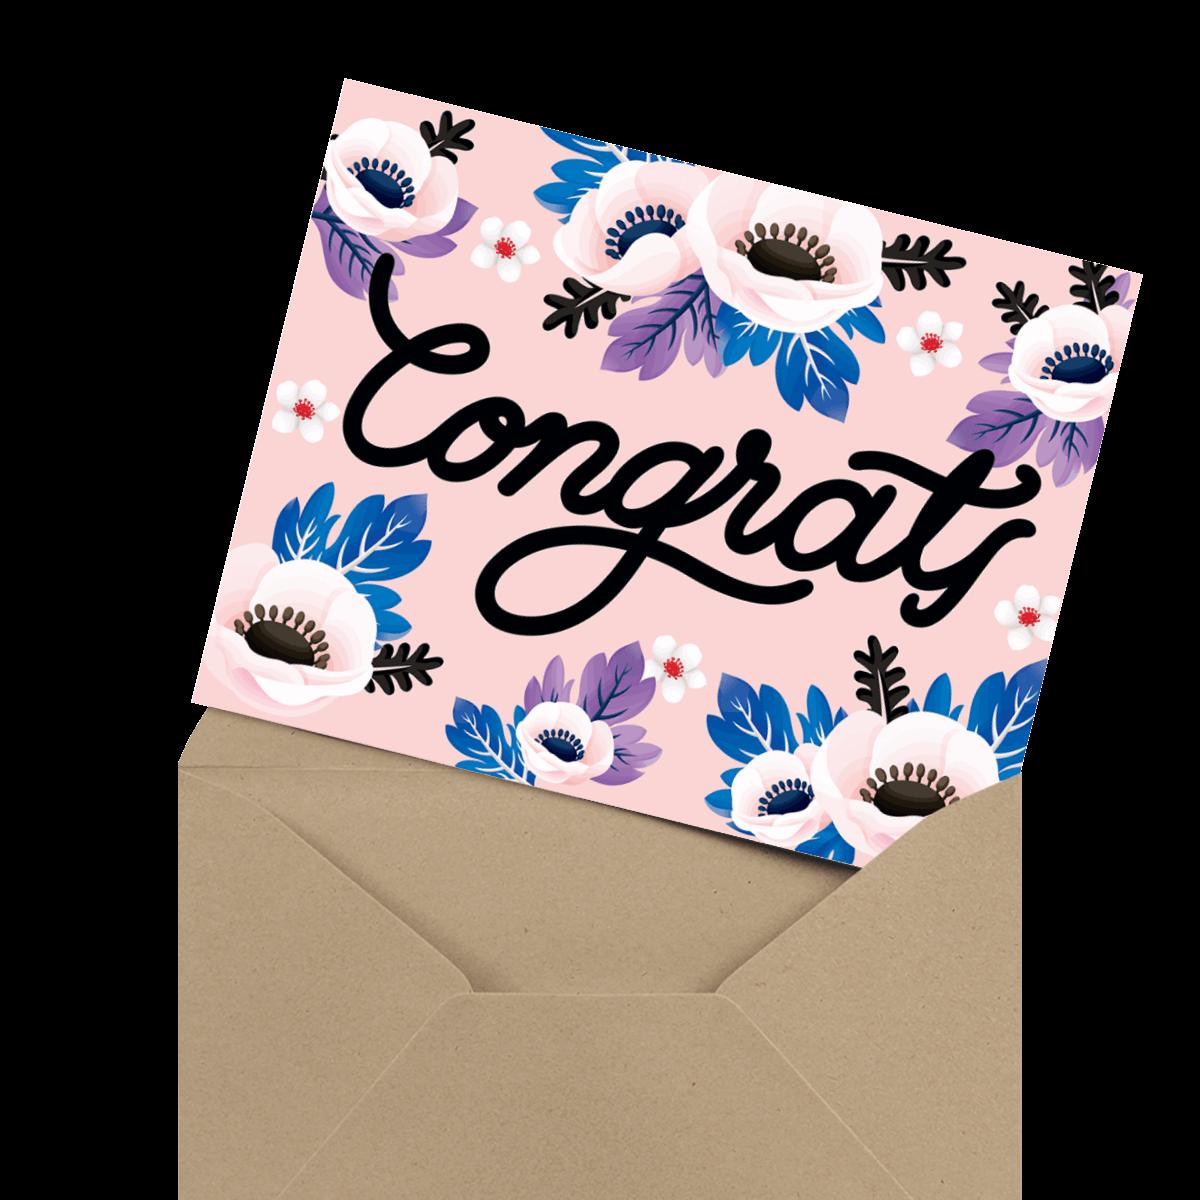 stunning pink congrats greeting card